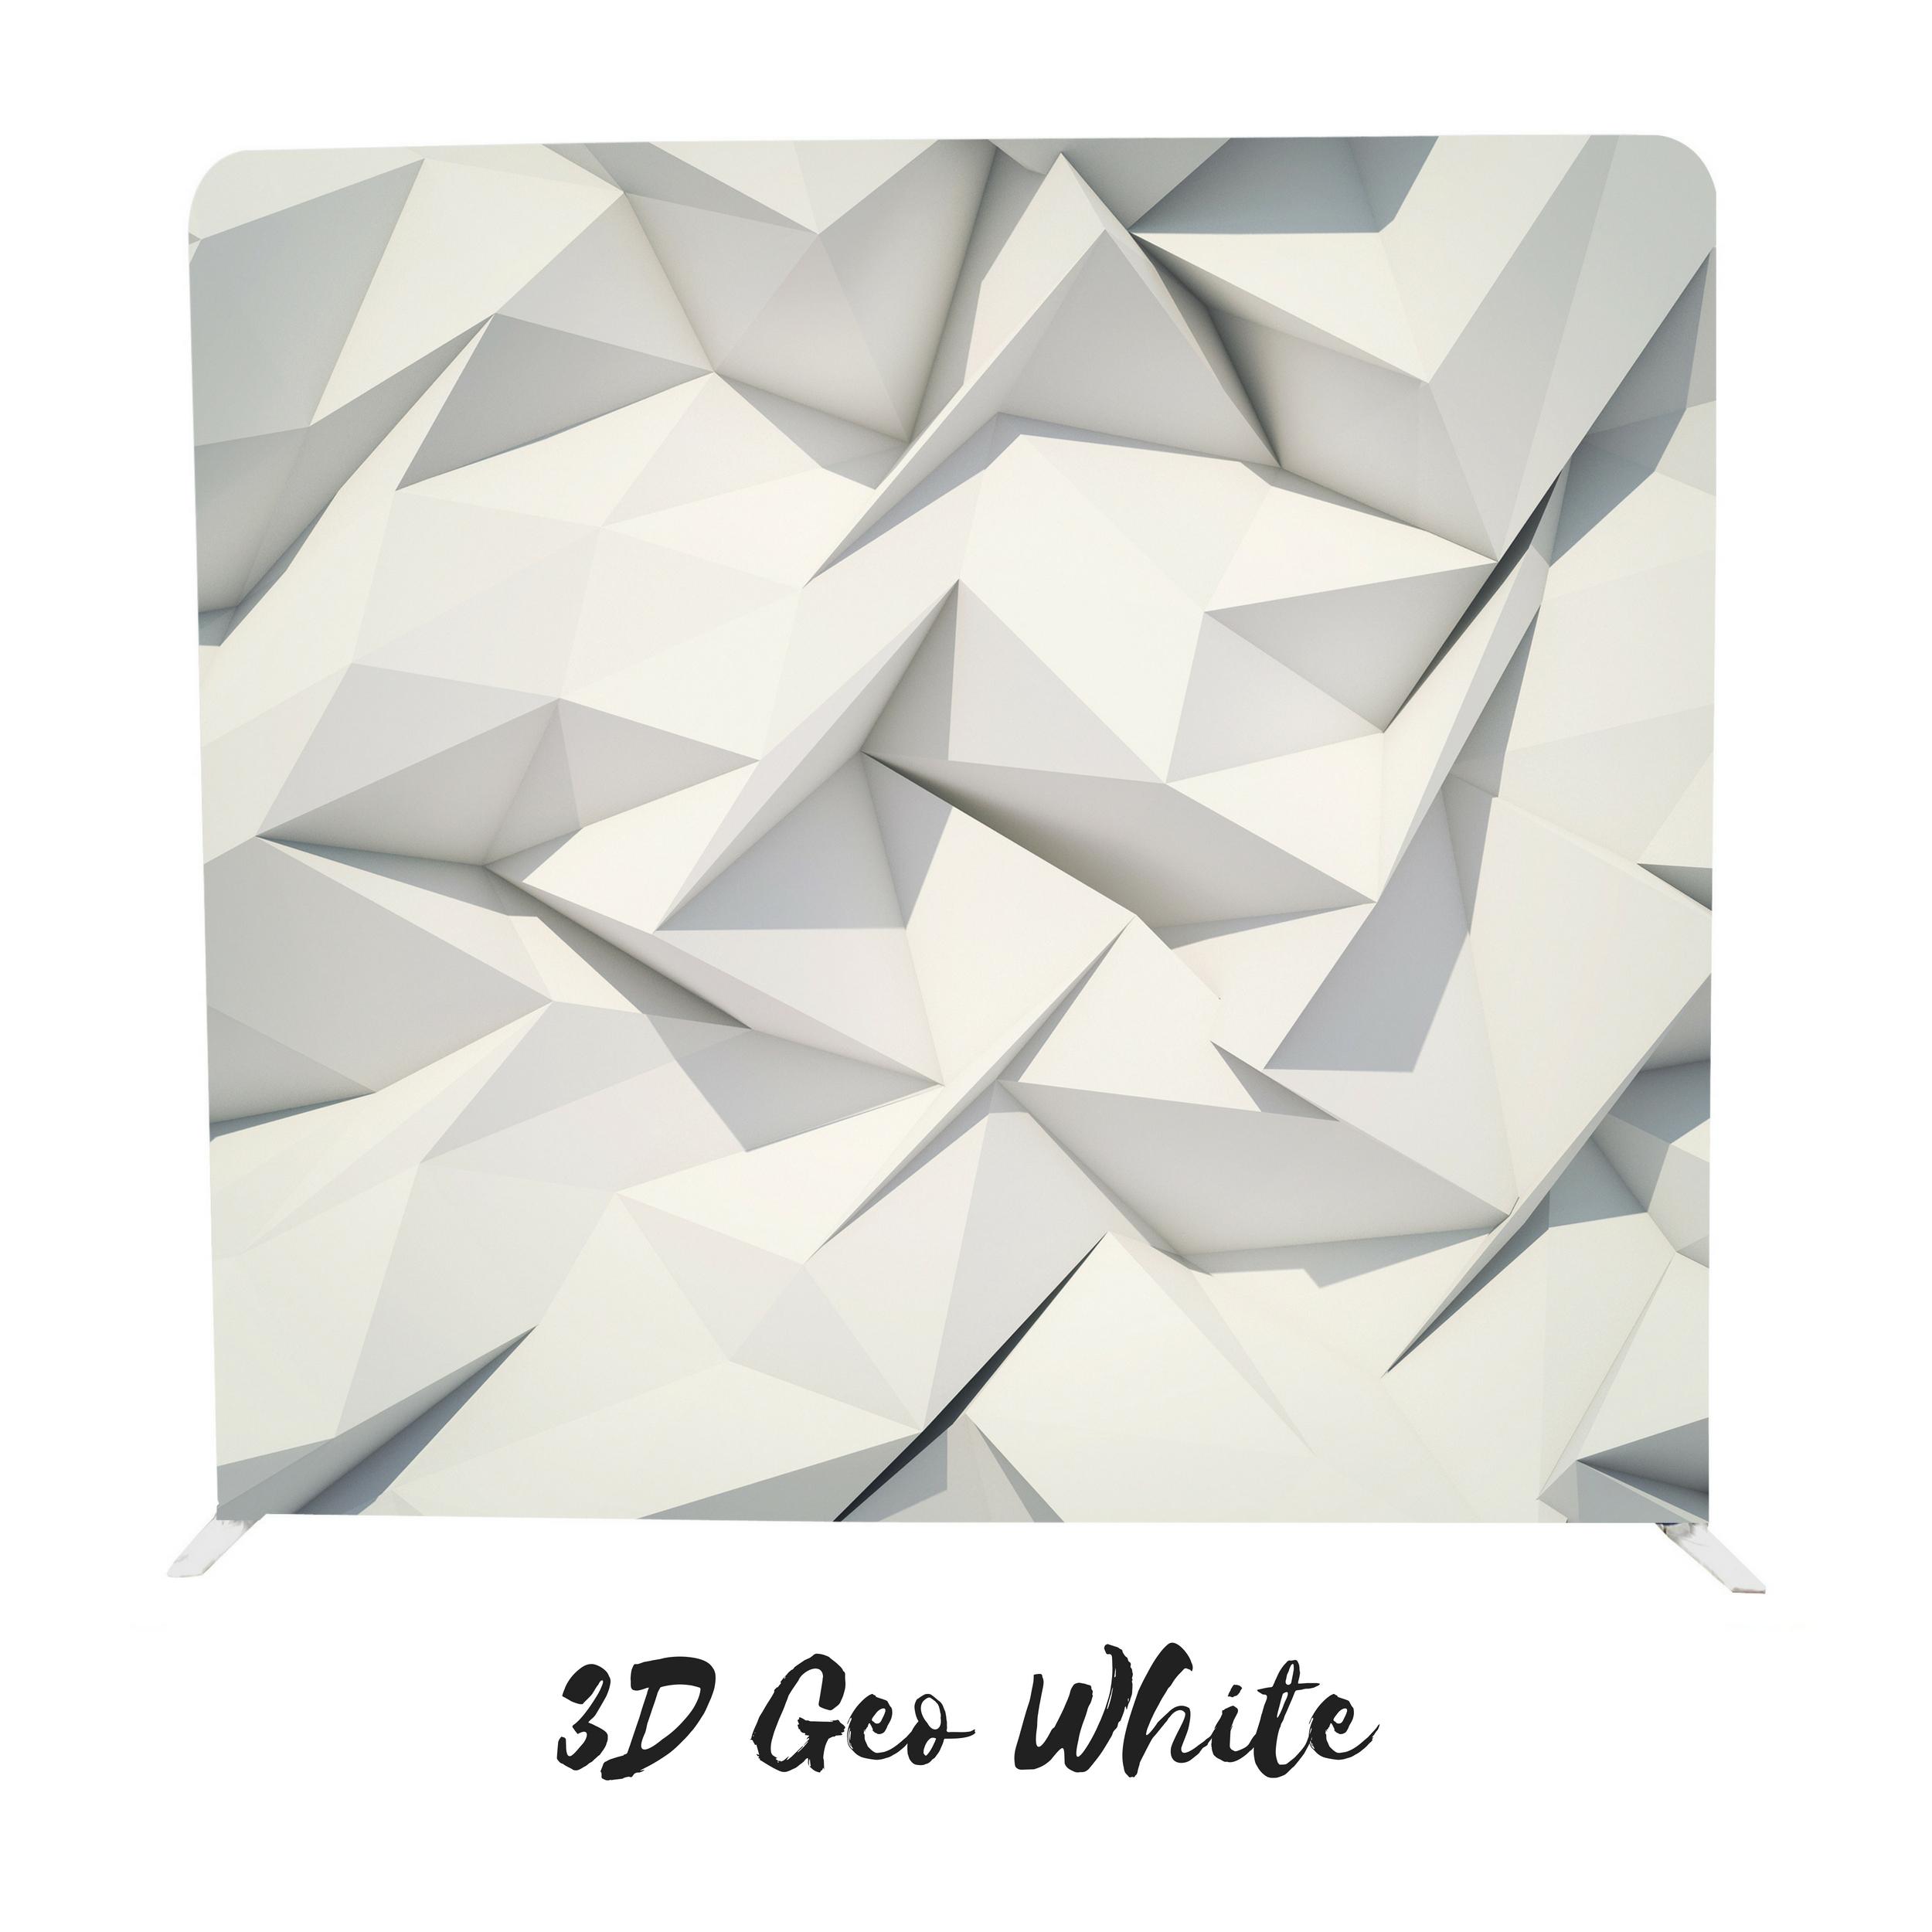 3d Geo White.jpg